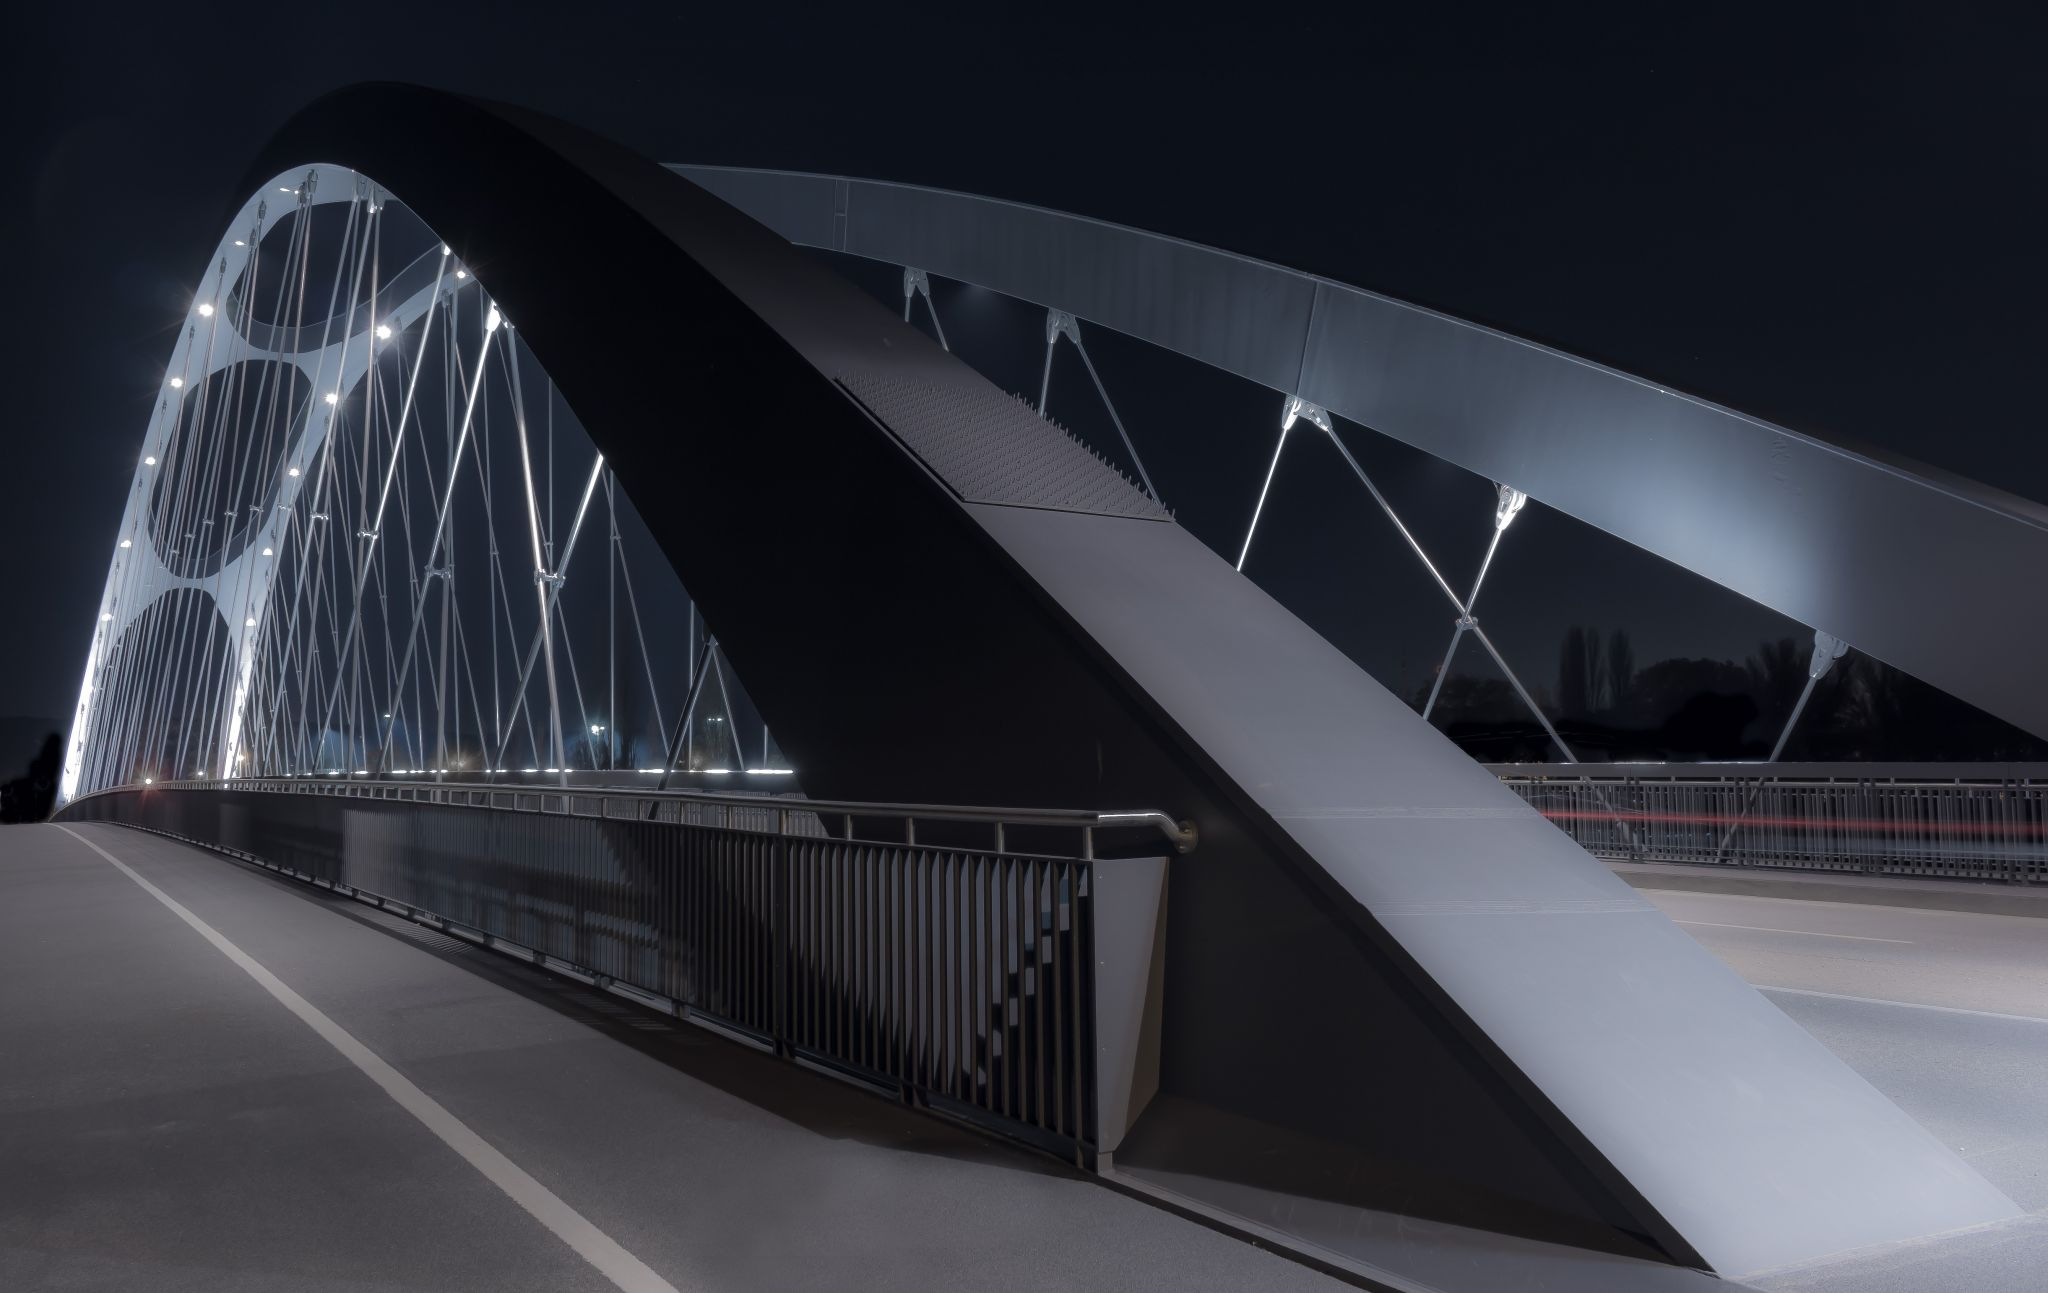 Osthafenbrücke, Germany